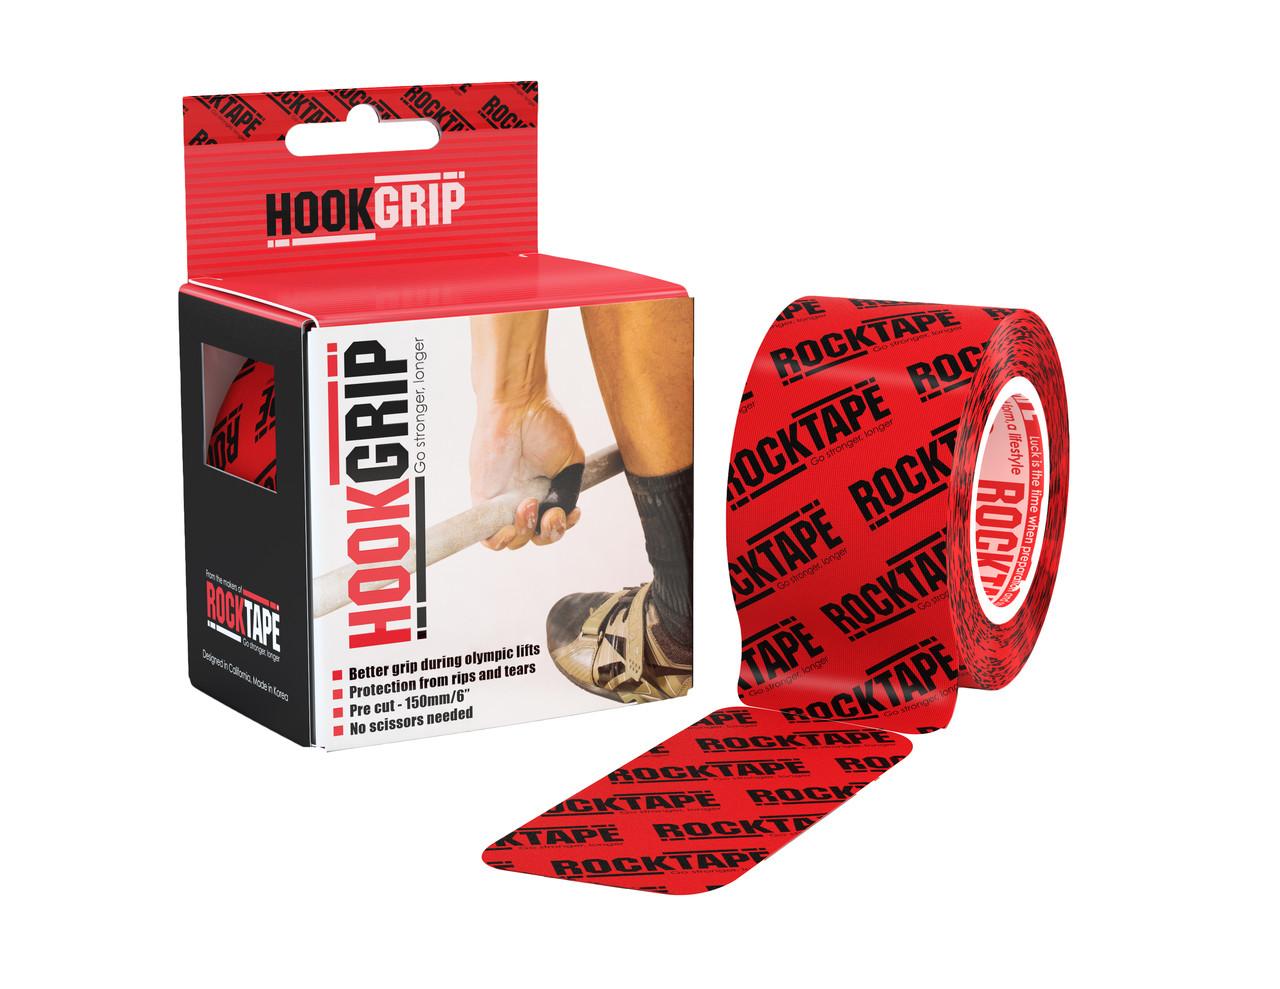 RockTape HookGrip, 5см×5м, 32 отрезка